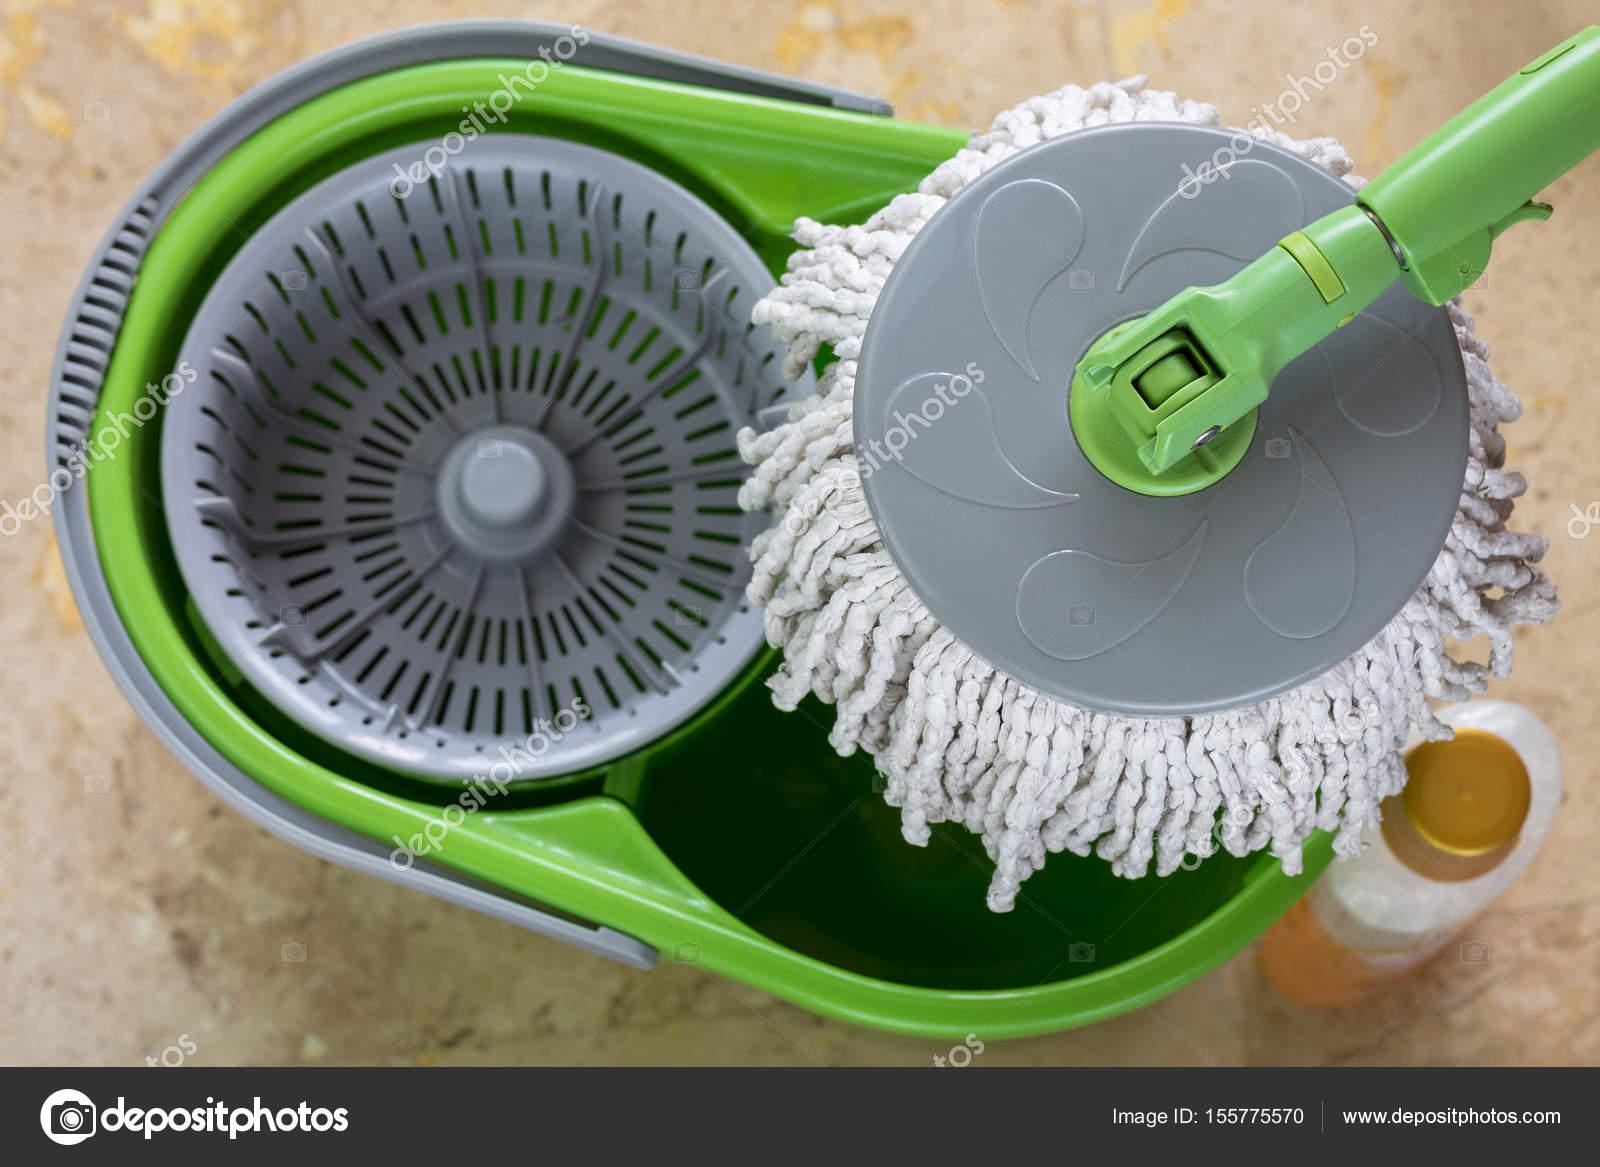 f5565853c Usa spin mop con cabezal de microfibra, mango verde en un cubo para limpiar  —